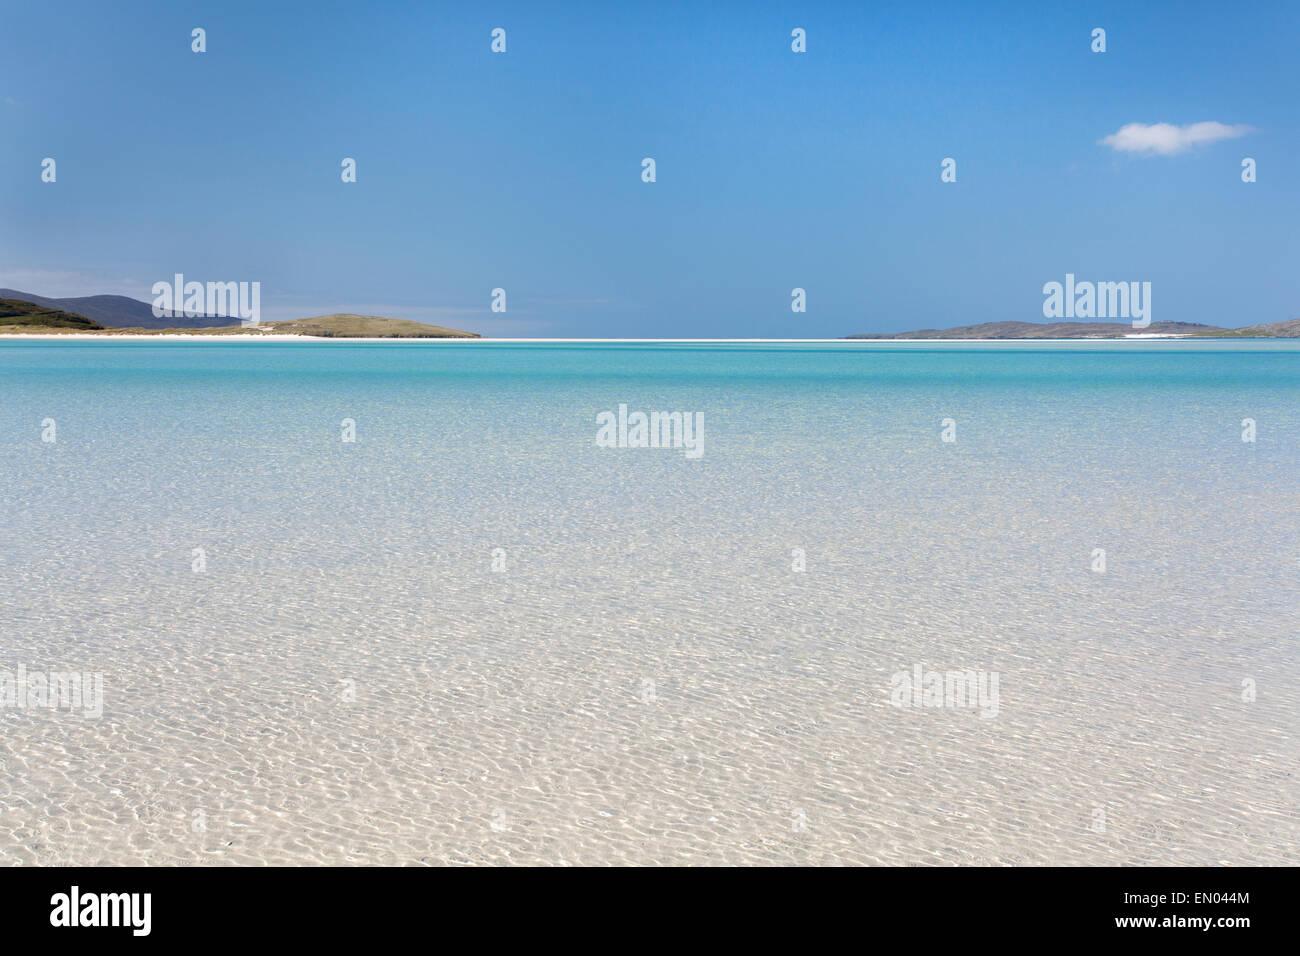 Clear sea water at Luskentyre beach, Isle of Harris, Scotland - Stock Image